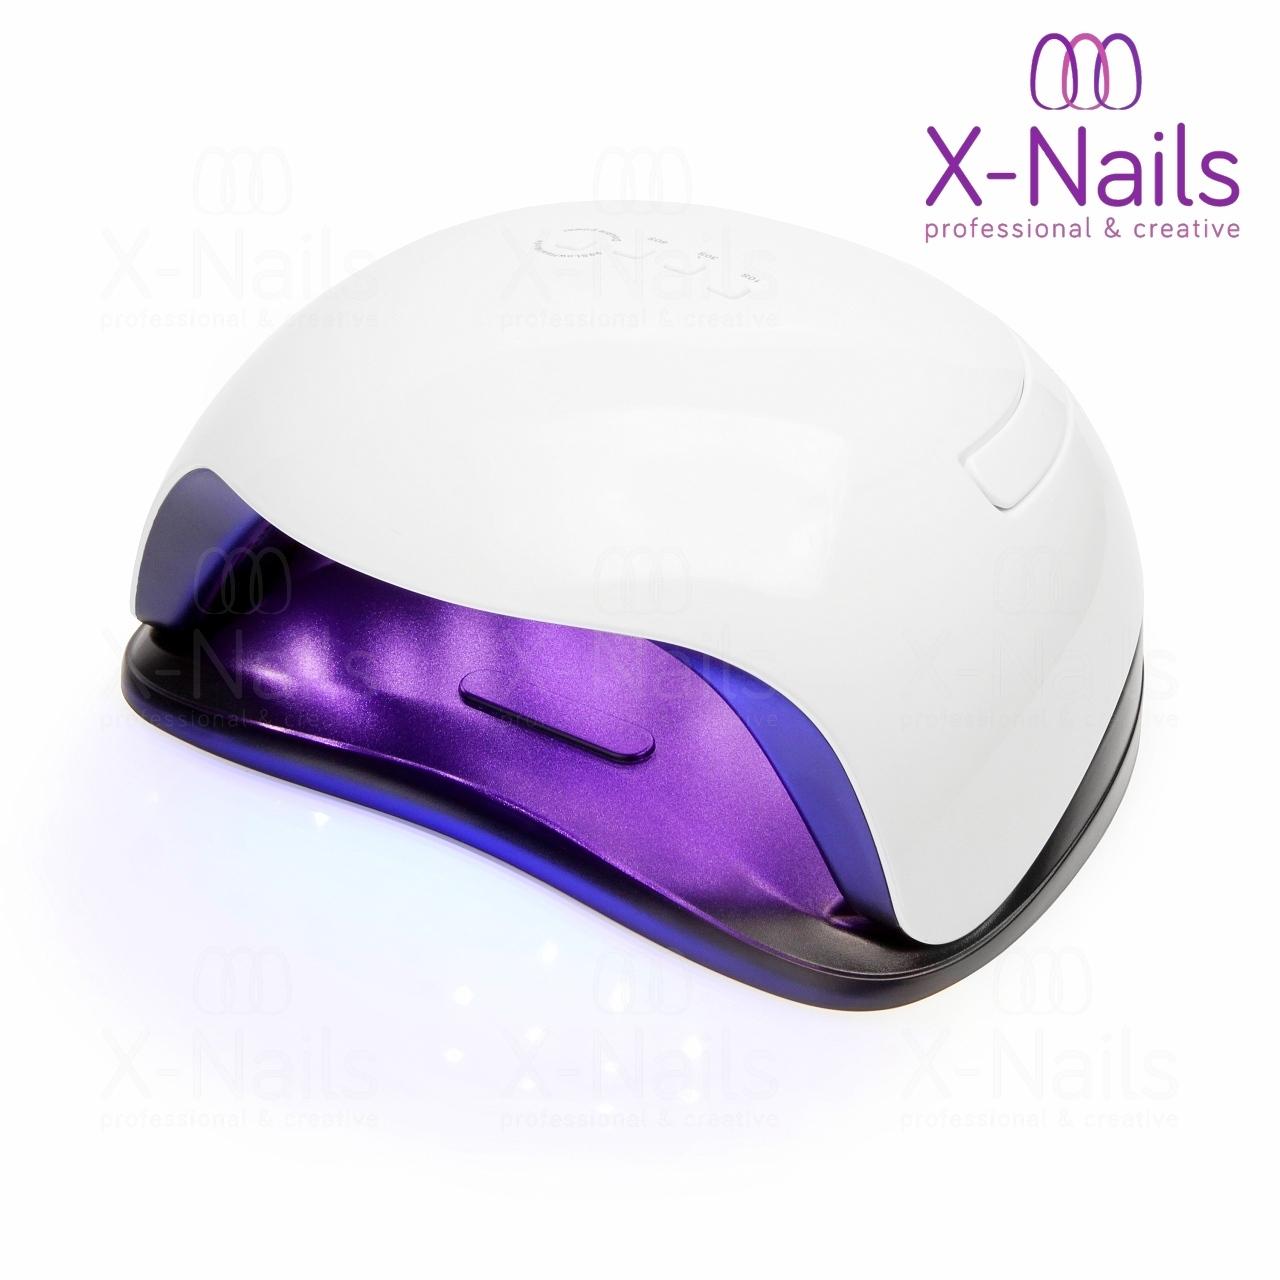 Dualni Uv Led Lampa Na Nehty 54w Lampa Pro 2 Ruce Excellent Power 54w